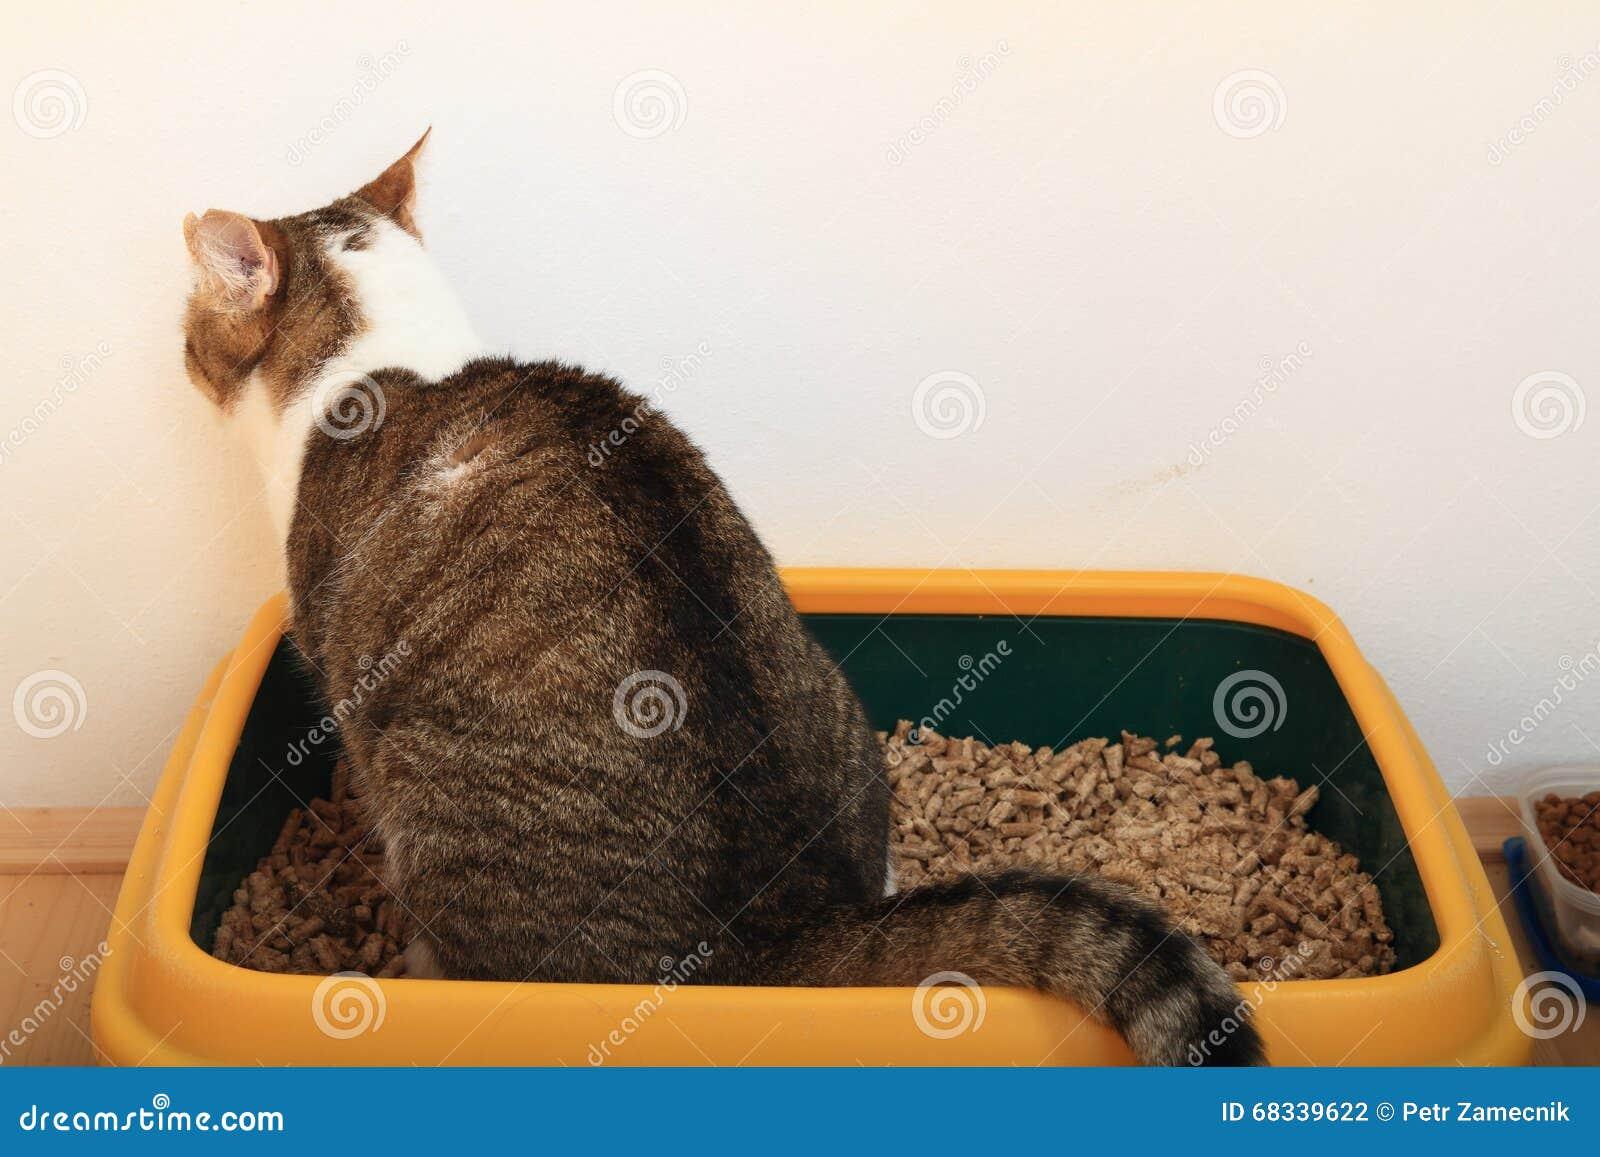 Tabby cat on litter box